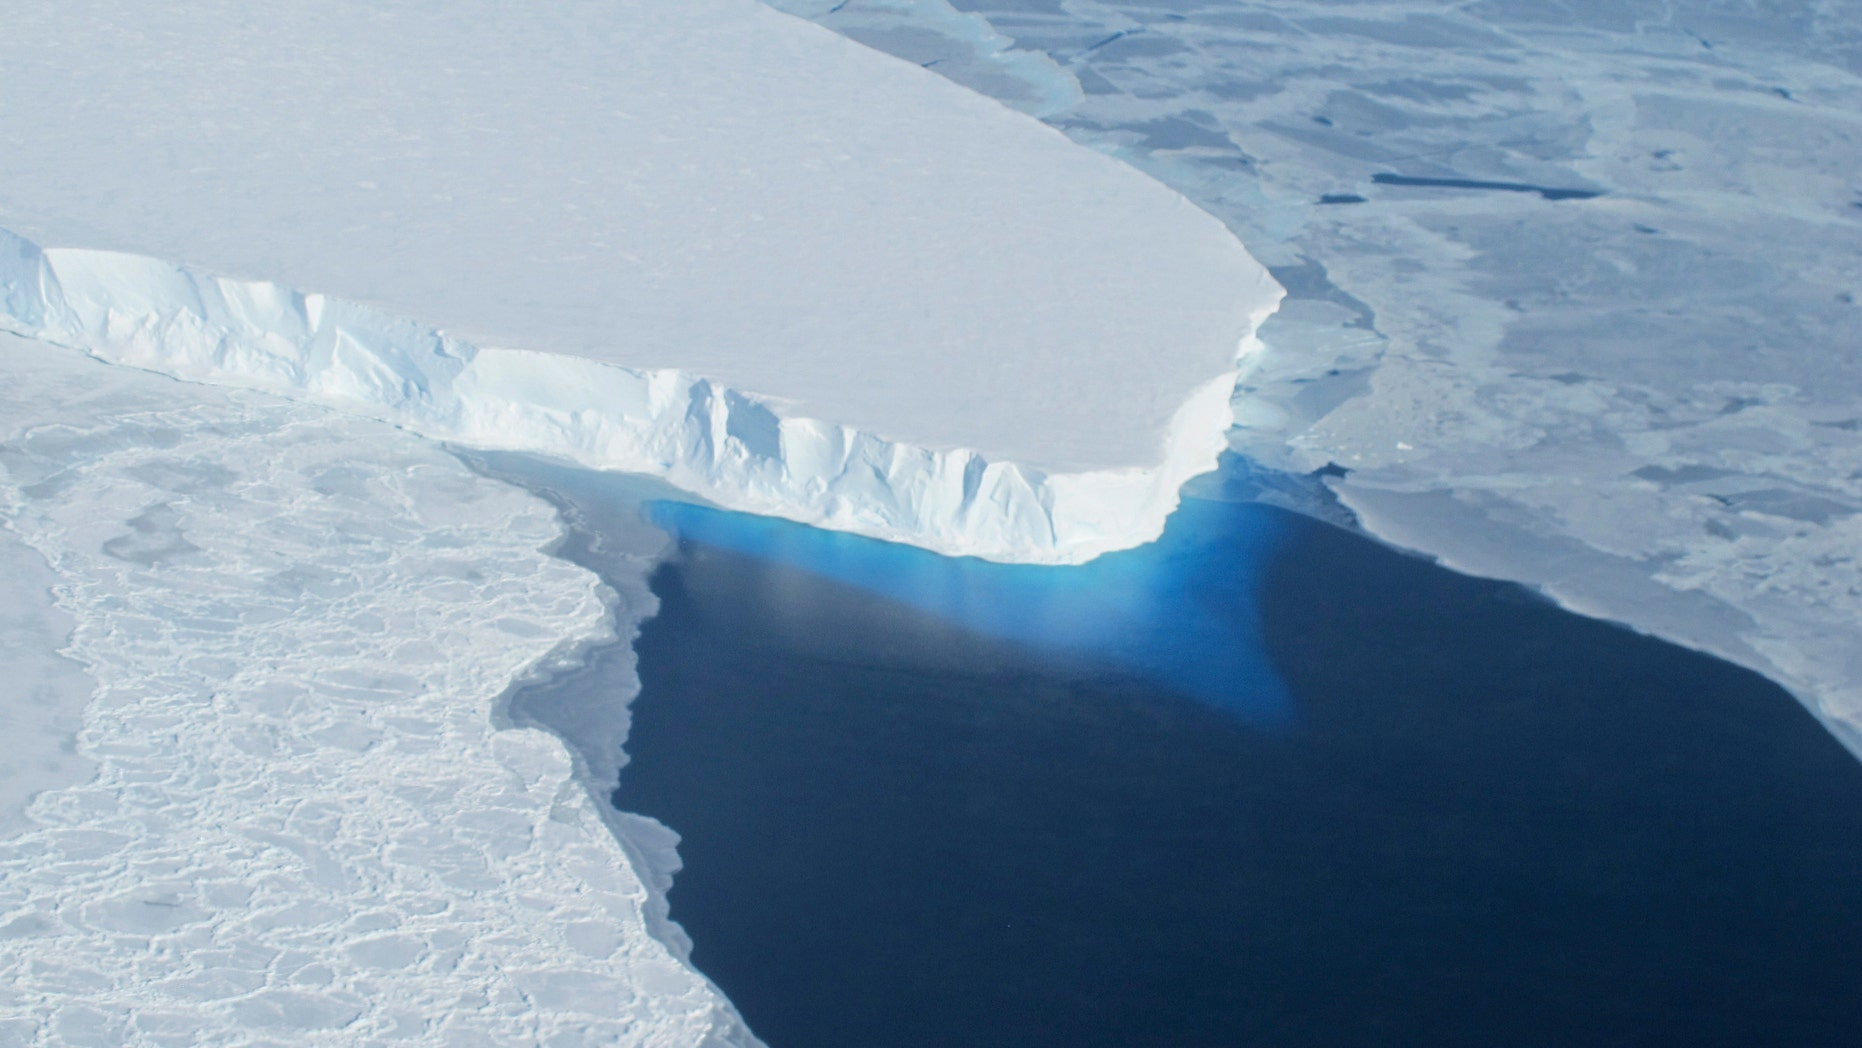 The Thwaites Glacier in Antarctica is seen in this undated NASA image. (REUTERS/NASA/Handout via Reuters)